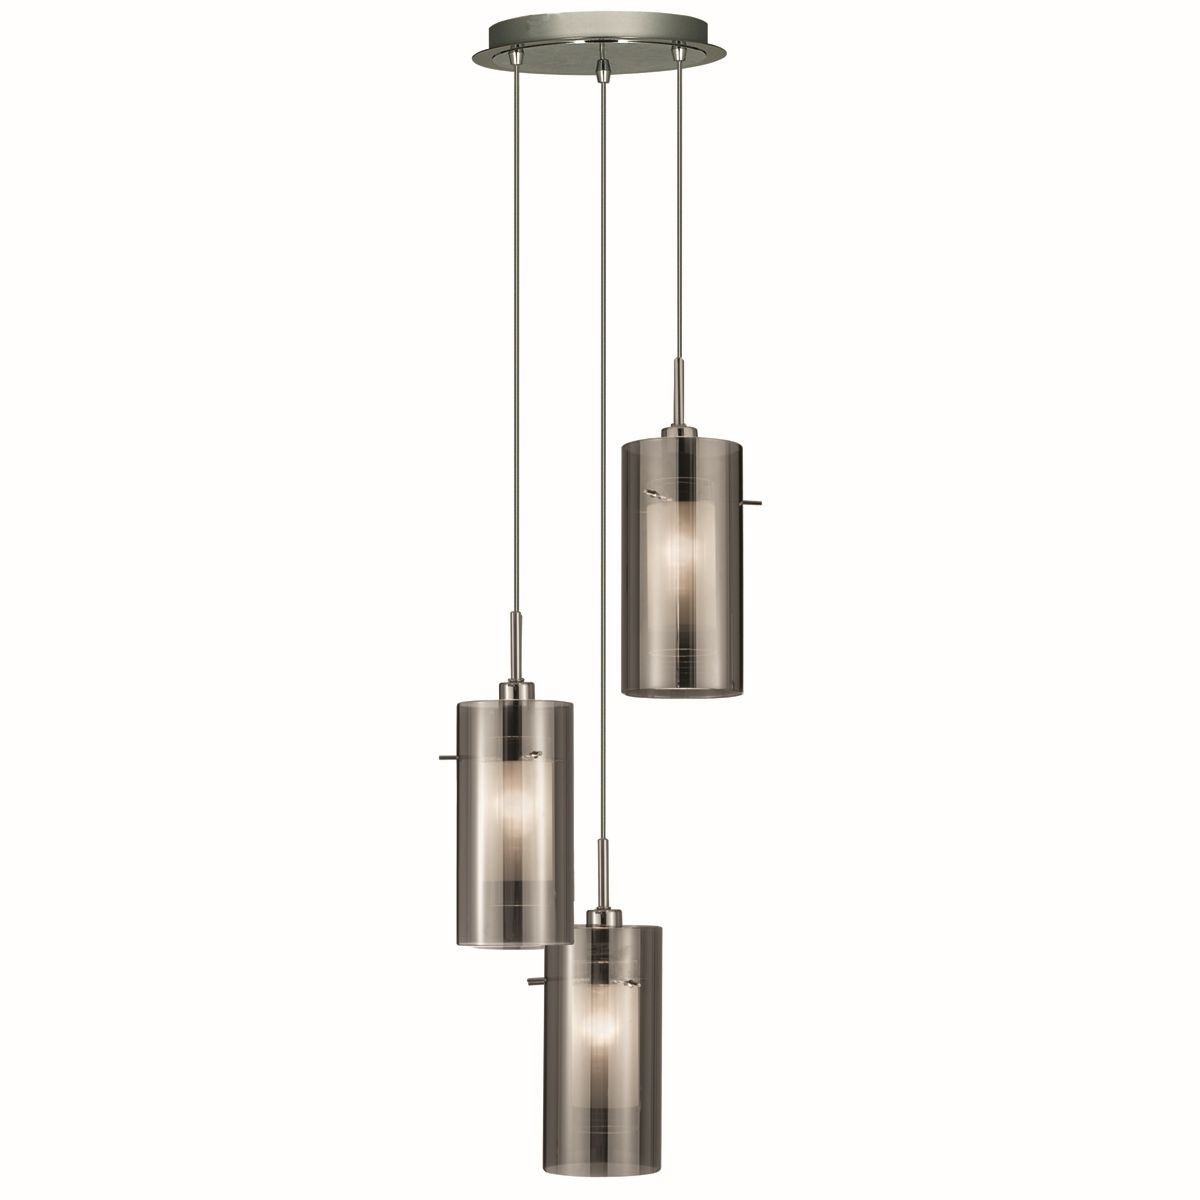 duo 2 smoked glass multi drop pendant 3 light chrome. Black Bedroom Furniture Sets. Home Design Ideas